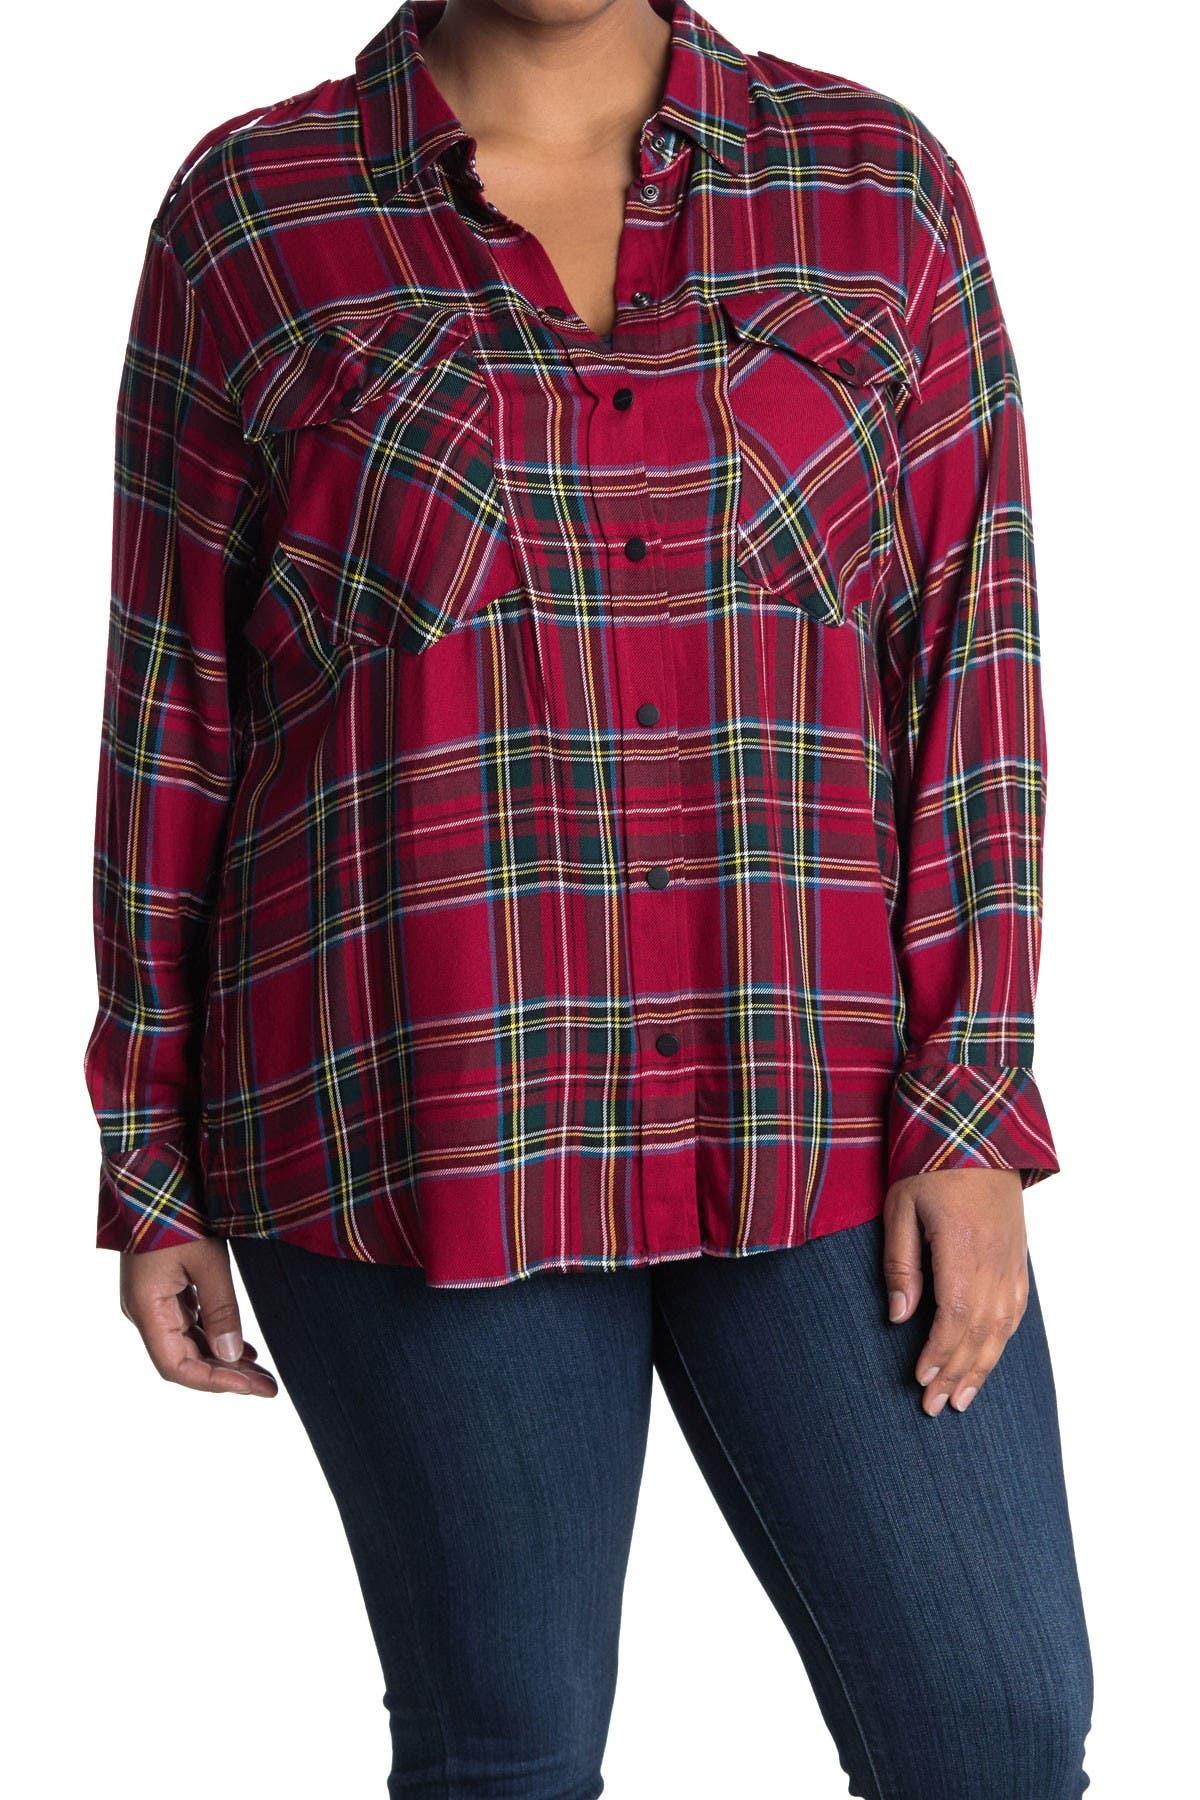 Image of Sanctuary Plaid Long Sleeve Boyfriend Shirt